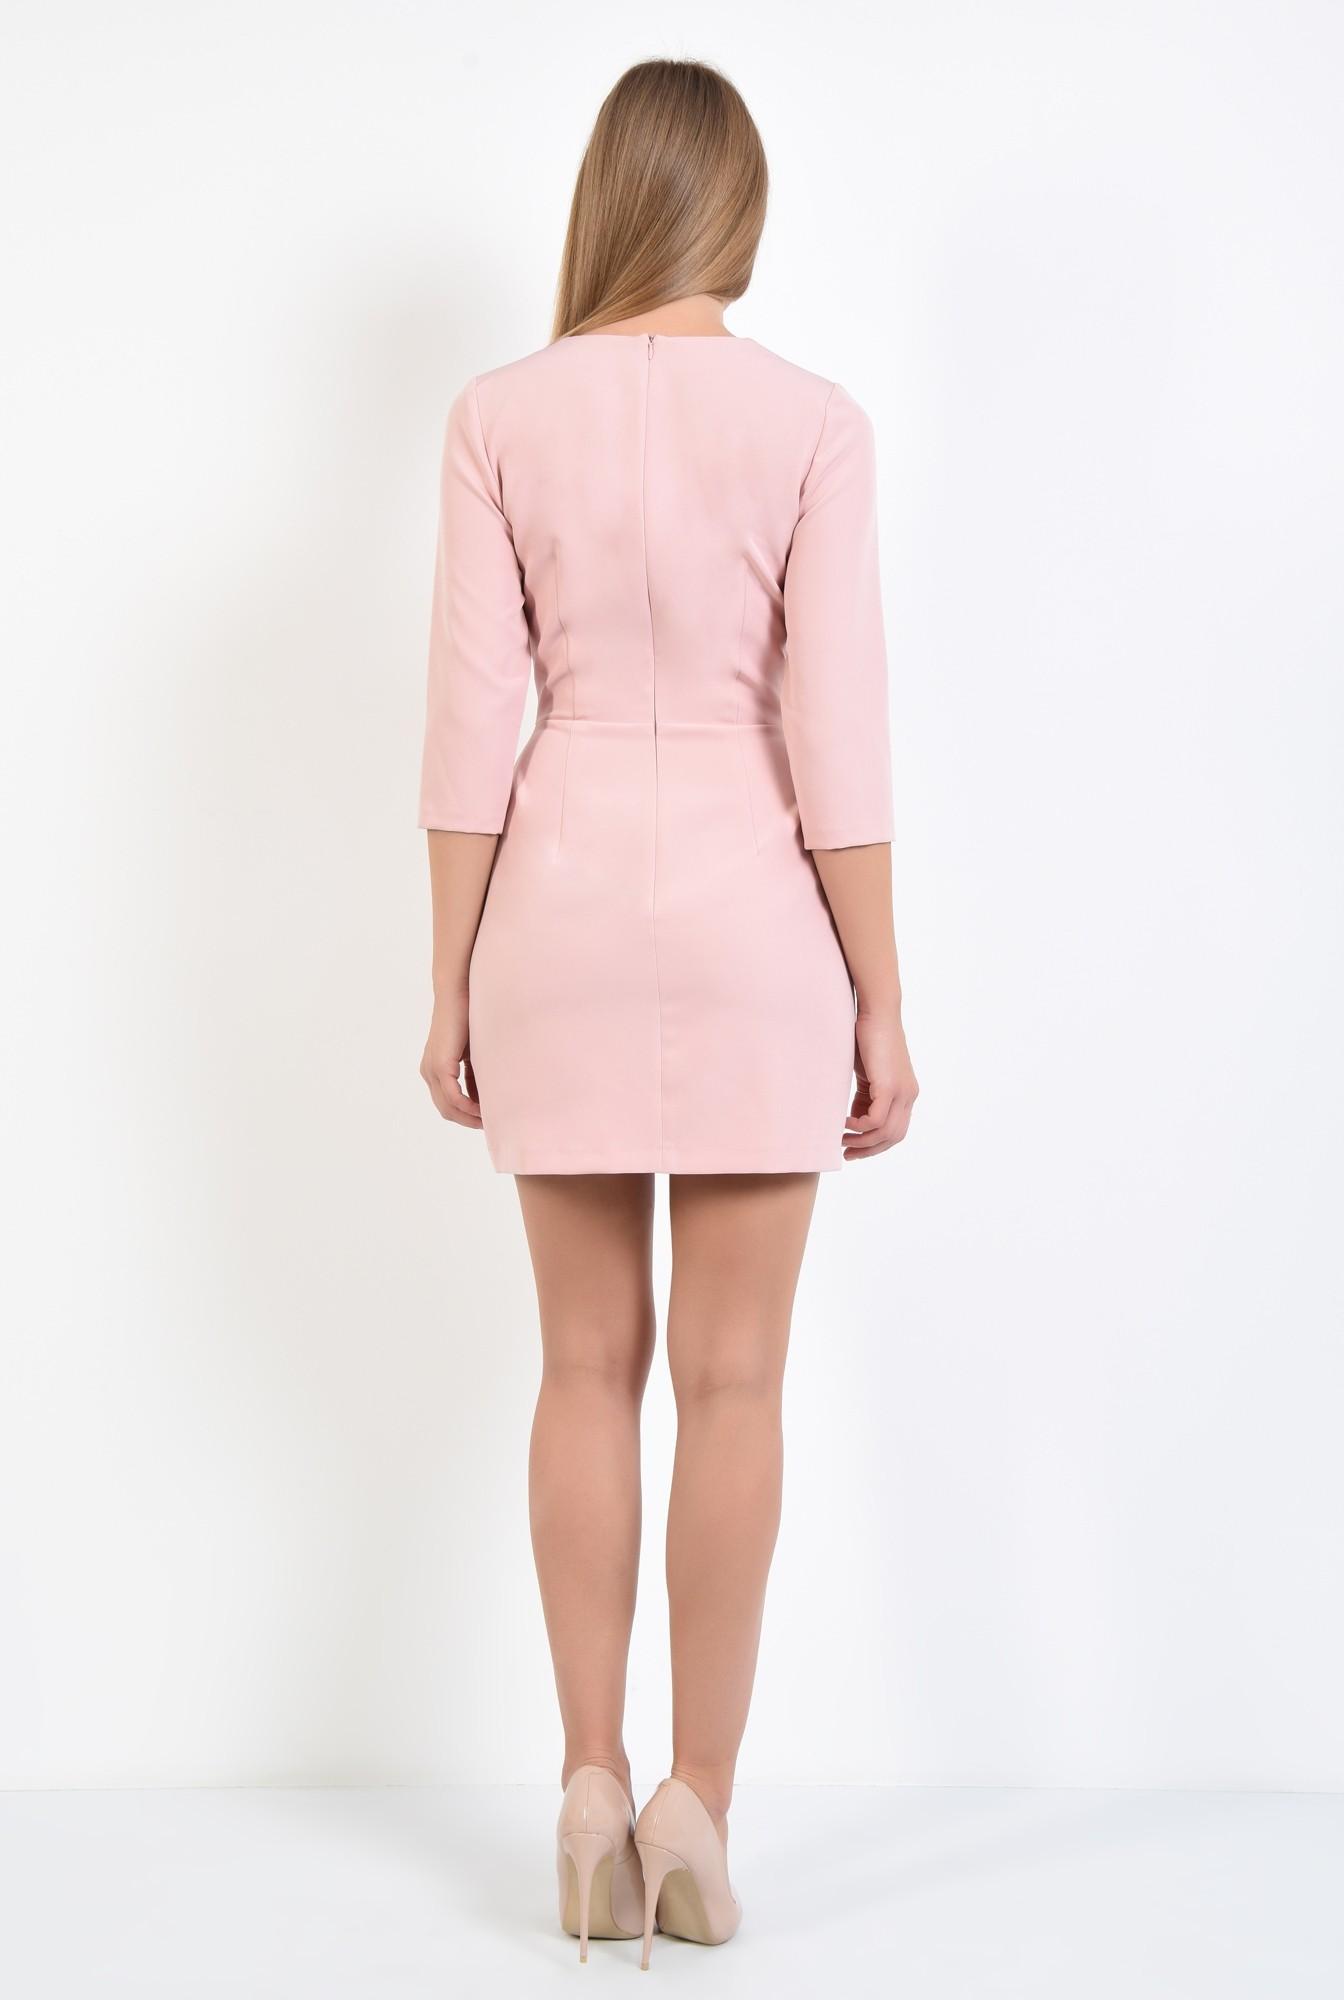 1 - rochie de ocazie, scurta, roz, volane, decolteu rotund